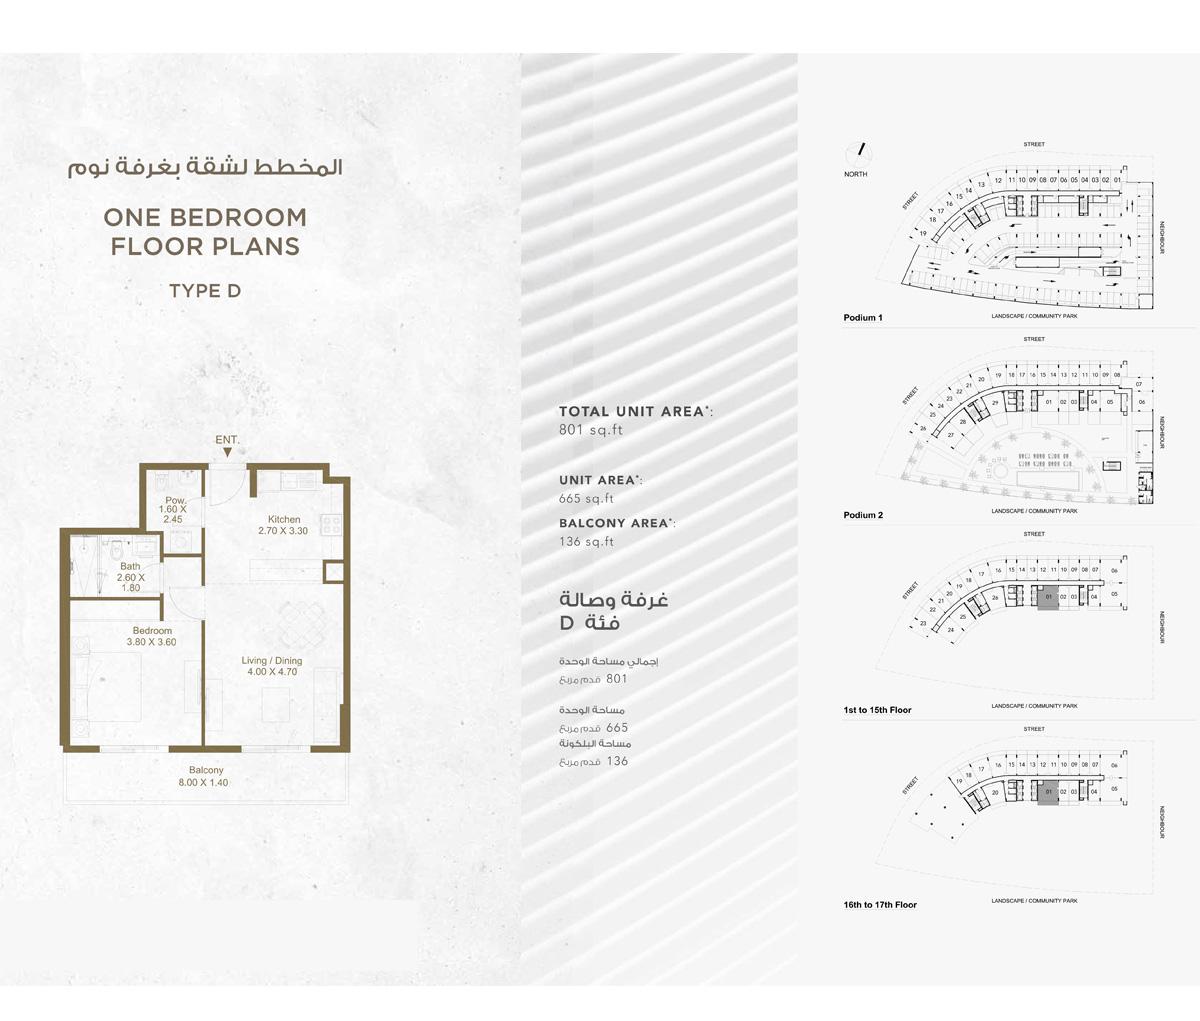 1 Bedroom Type D, Size 801 sq.ft